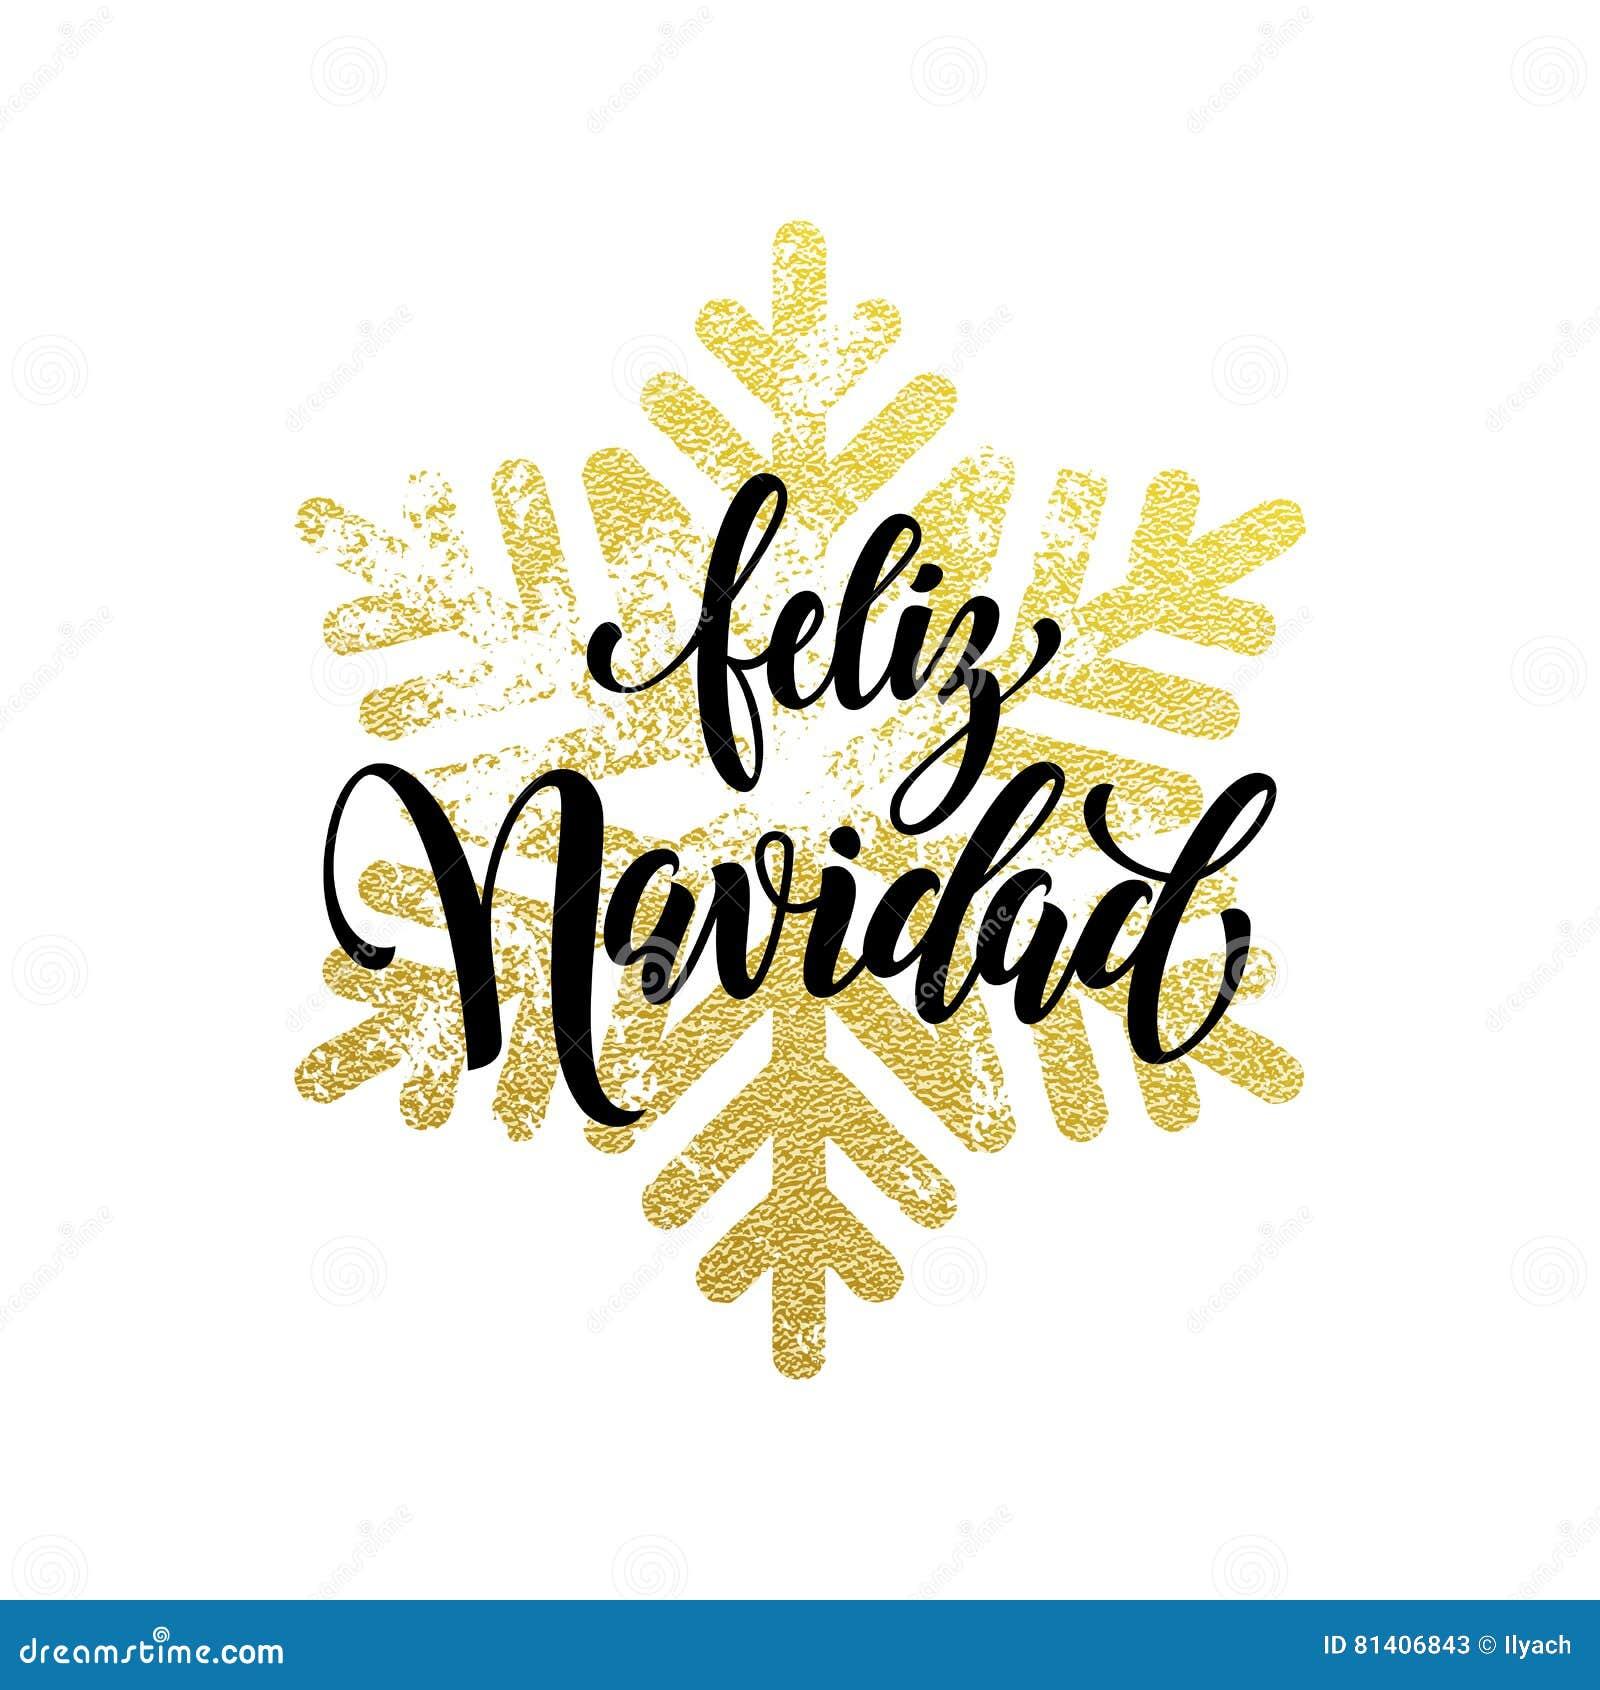 Feliz Navidad Golden Glitter Text Calligraphy Spanish Christmas ...